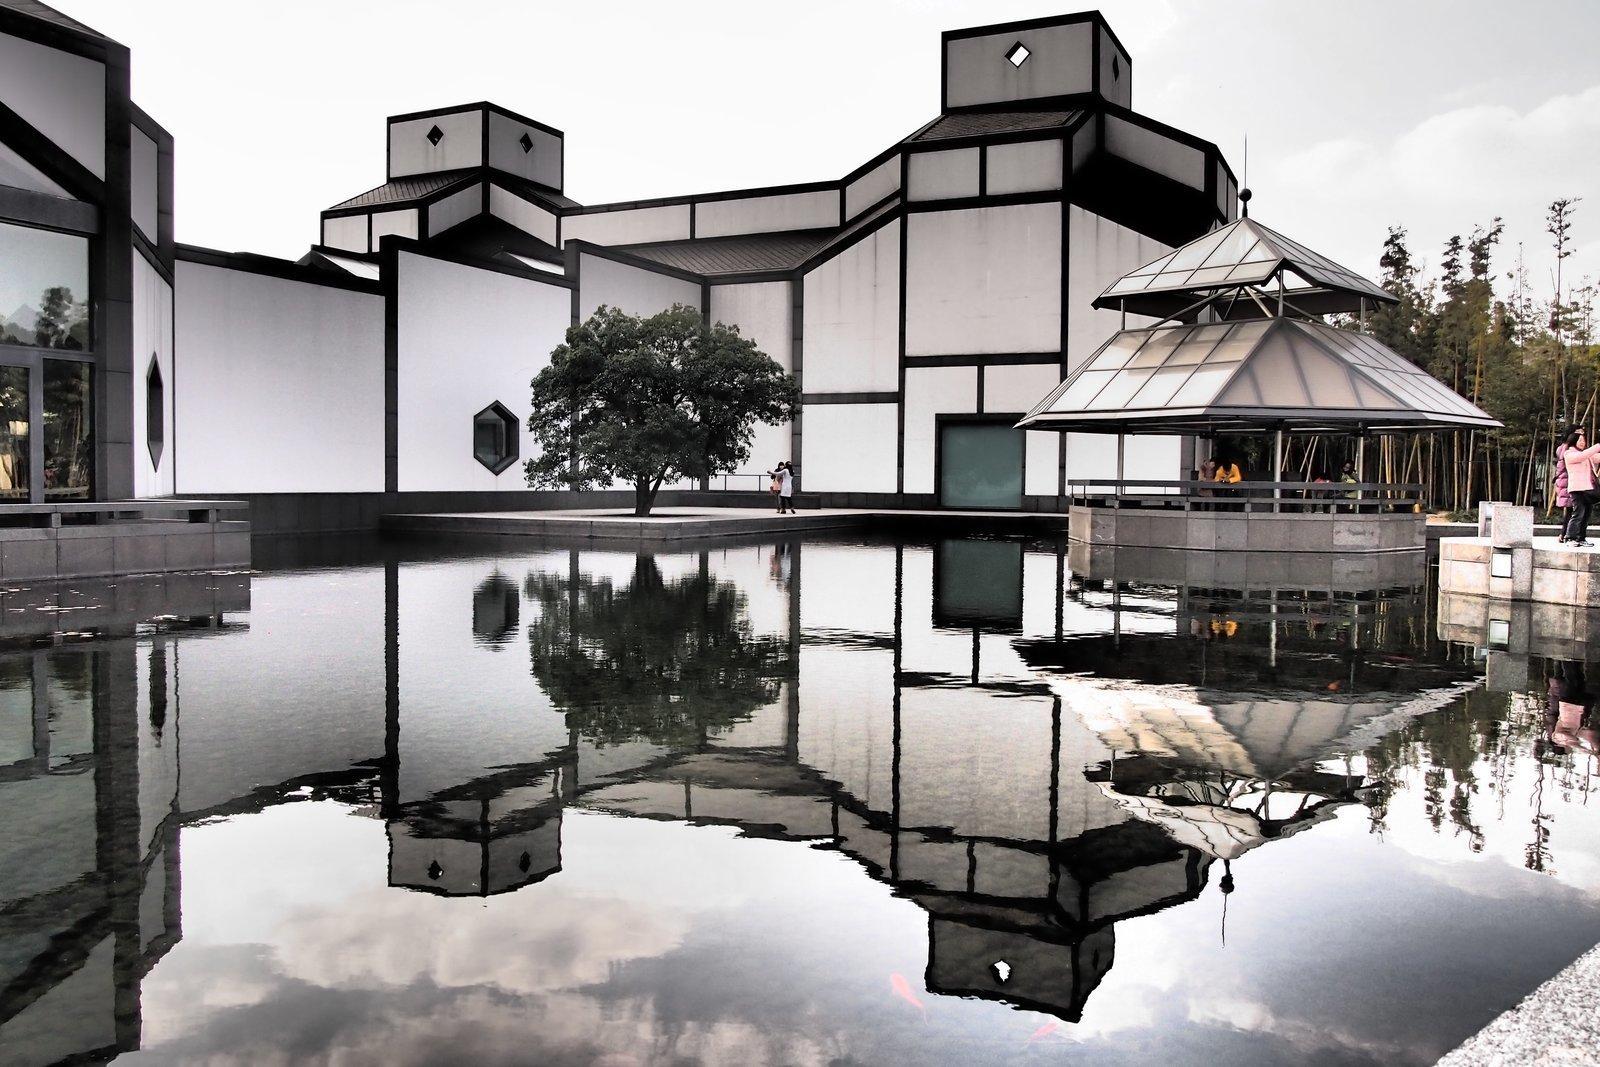 Photo 1 of 12 in 10 I.M. Pei Buildings We Love